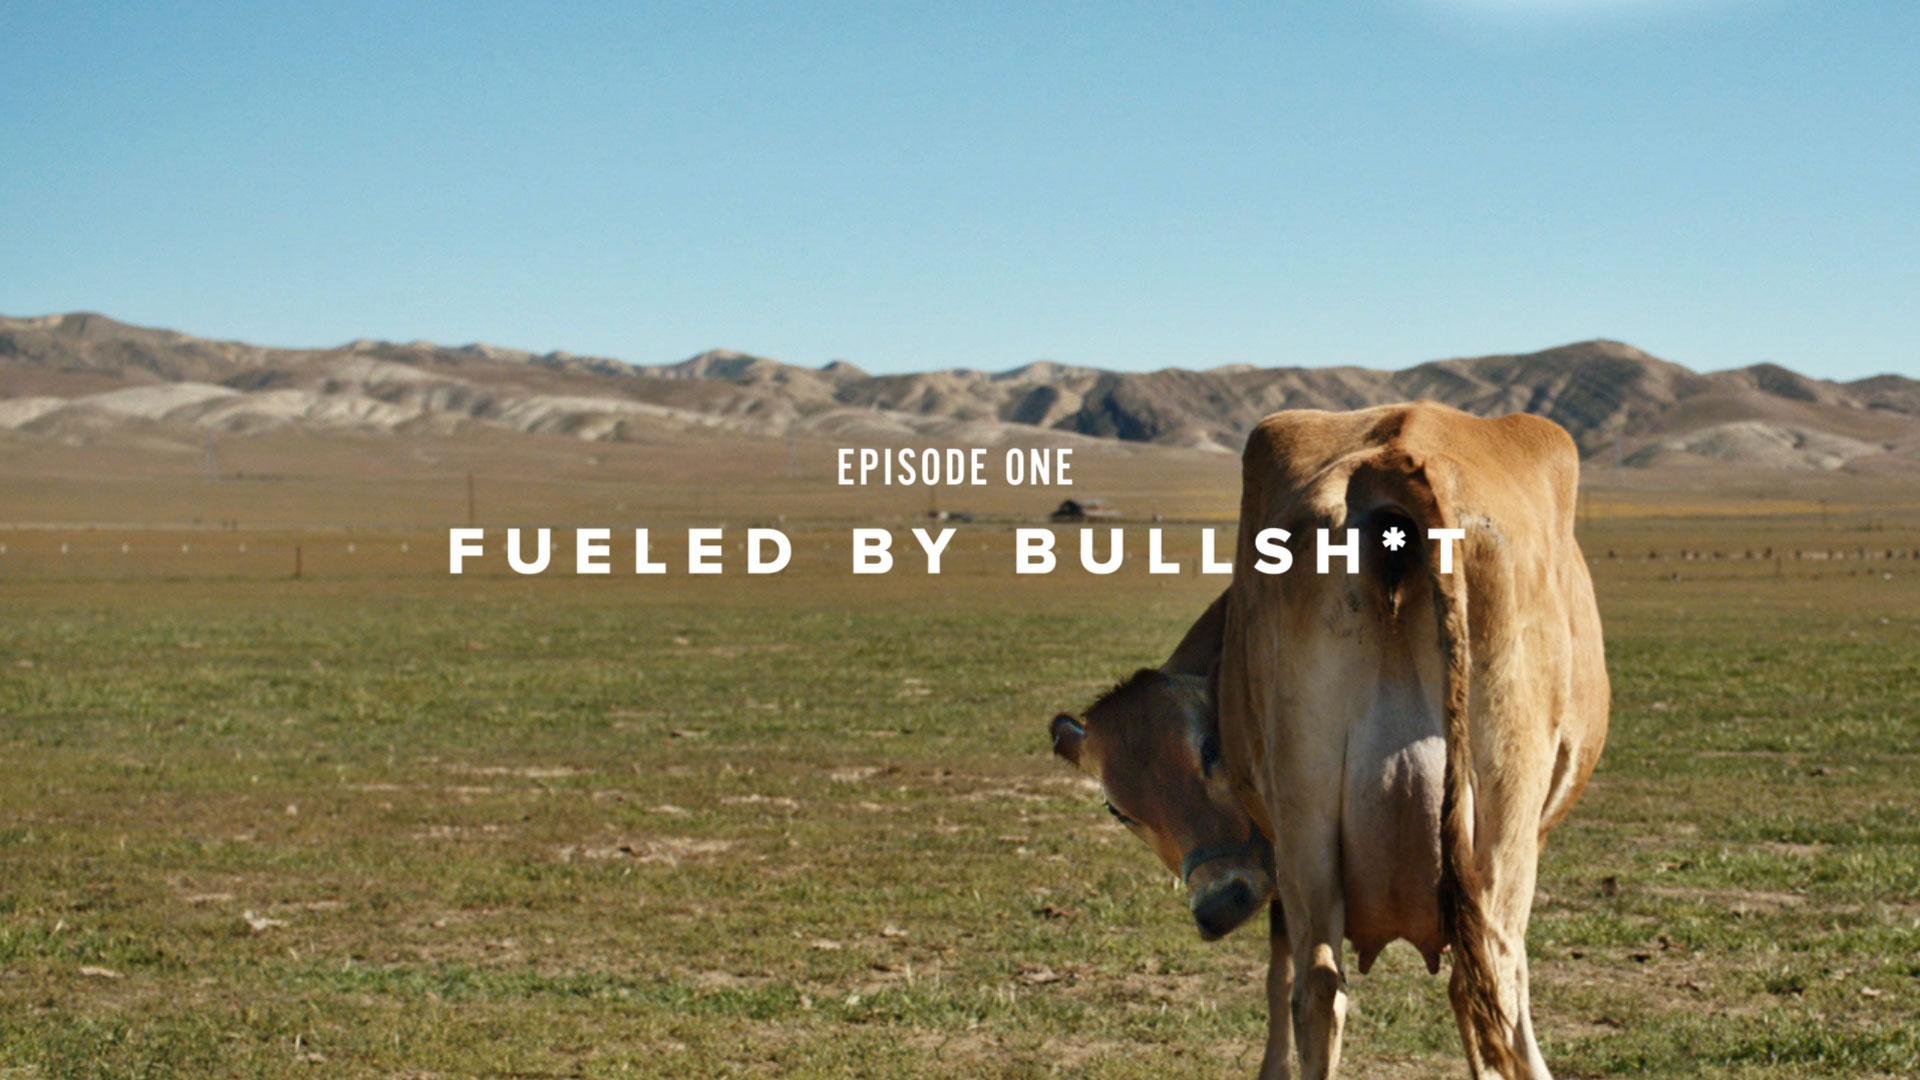 Fueled by Bullshit